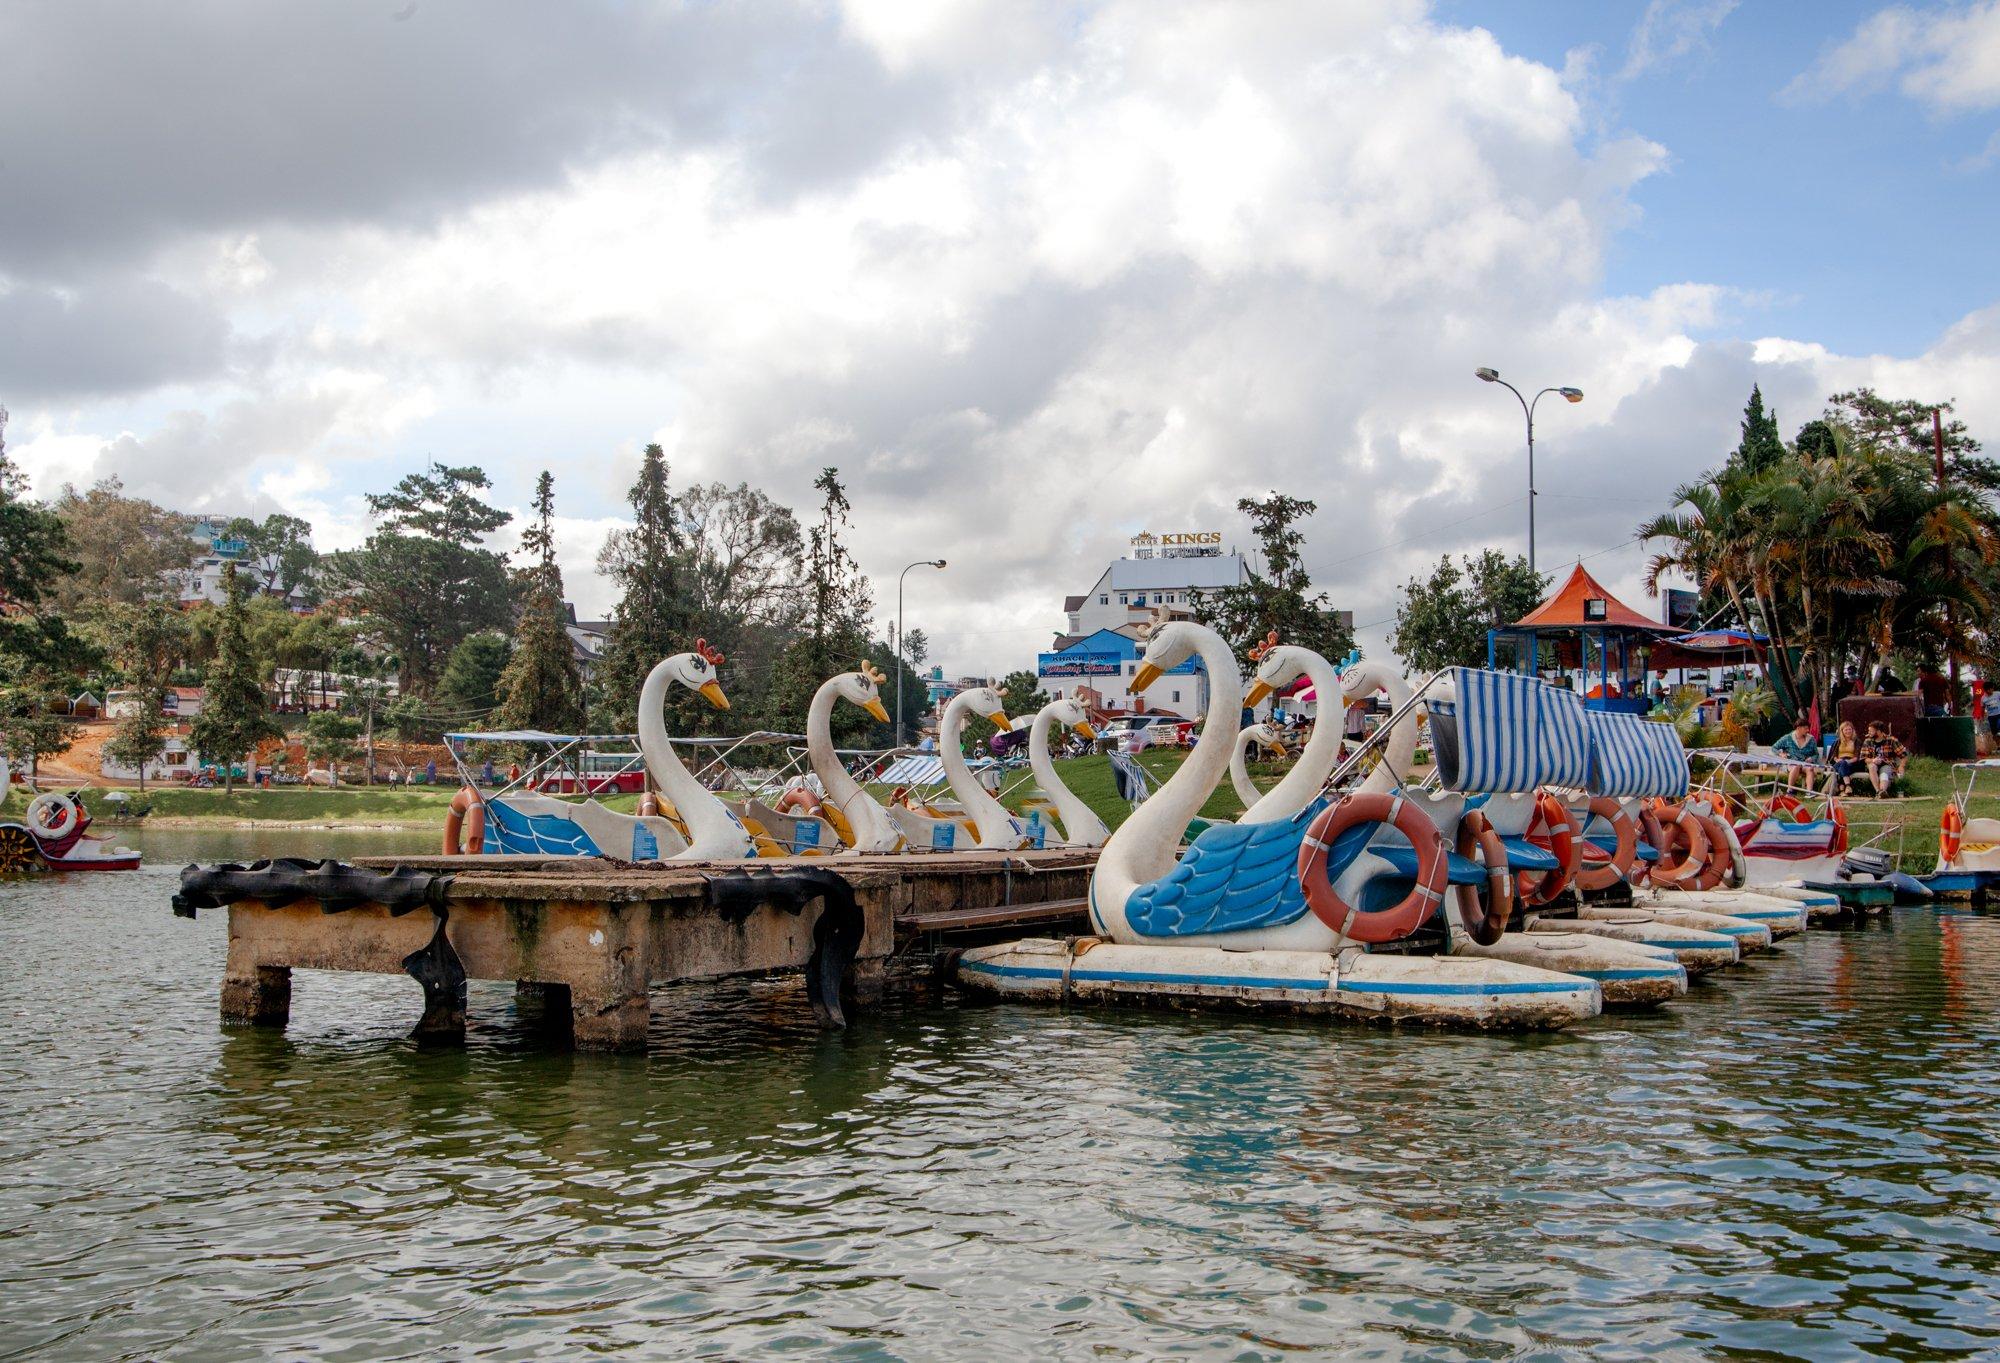 Swan Boats at the dock in Dalat Vietnam